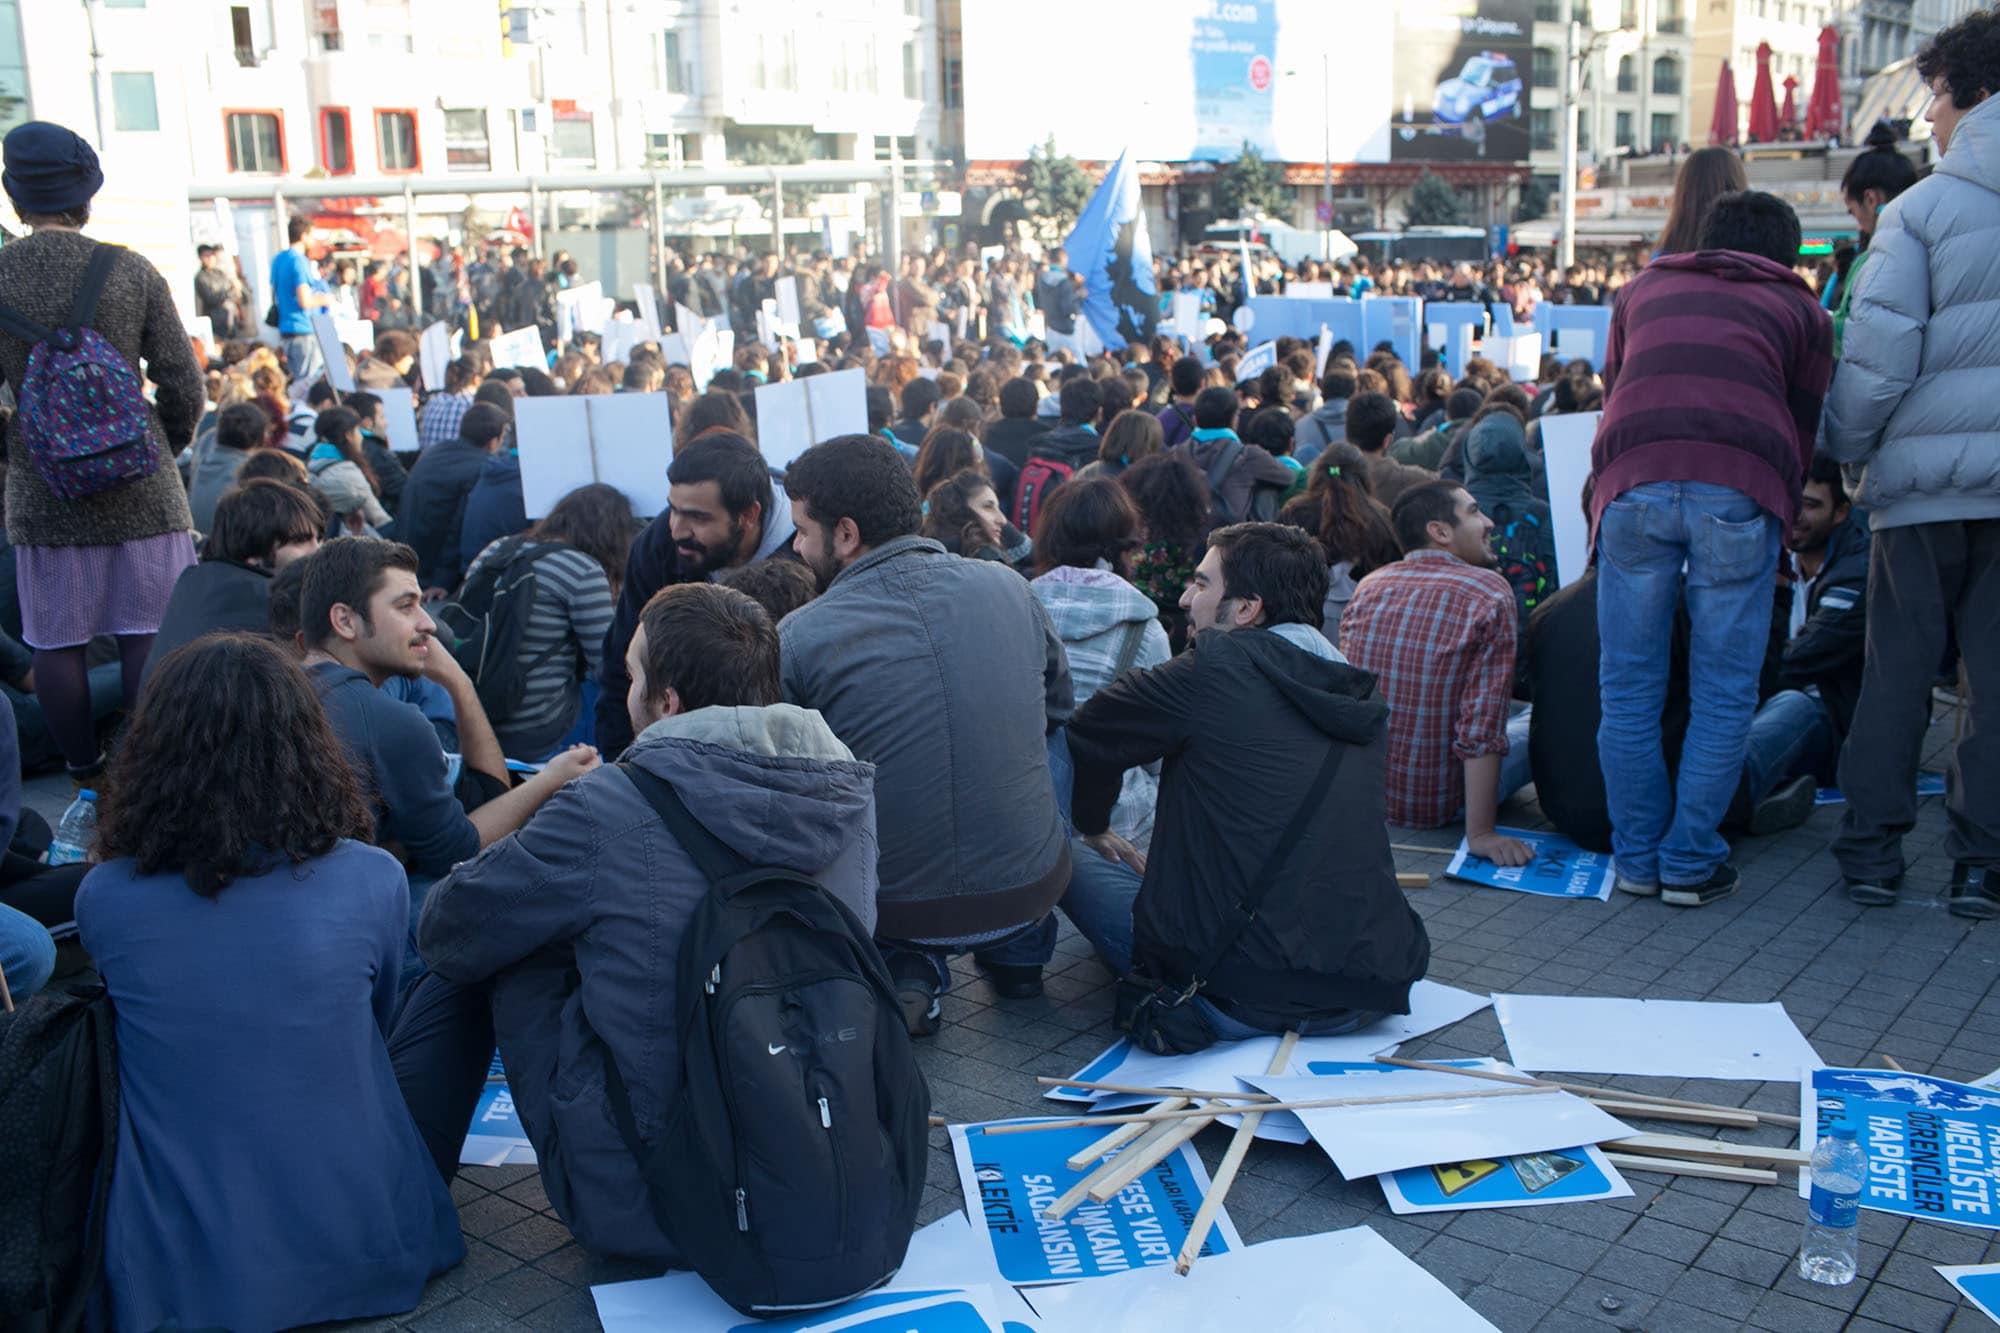 Protest in Taksim Square, Istanbul, Turkey